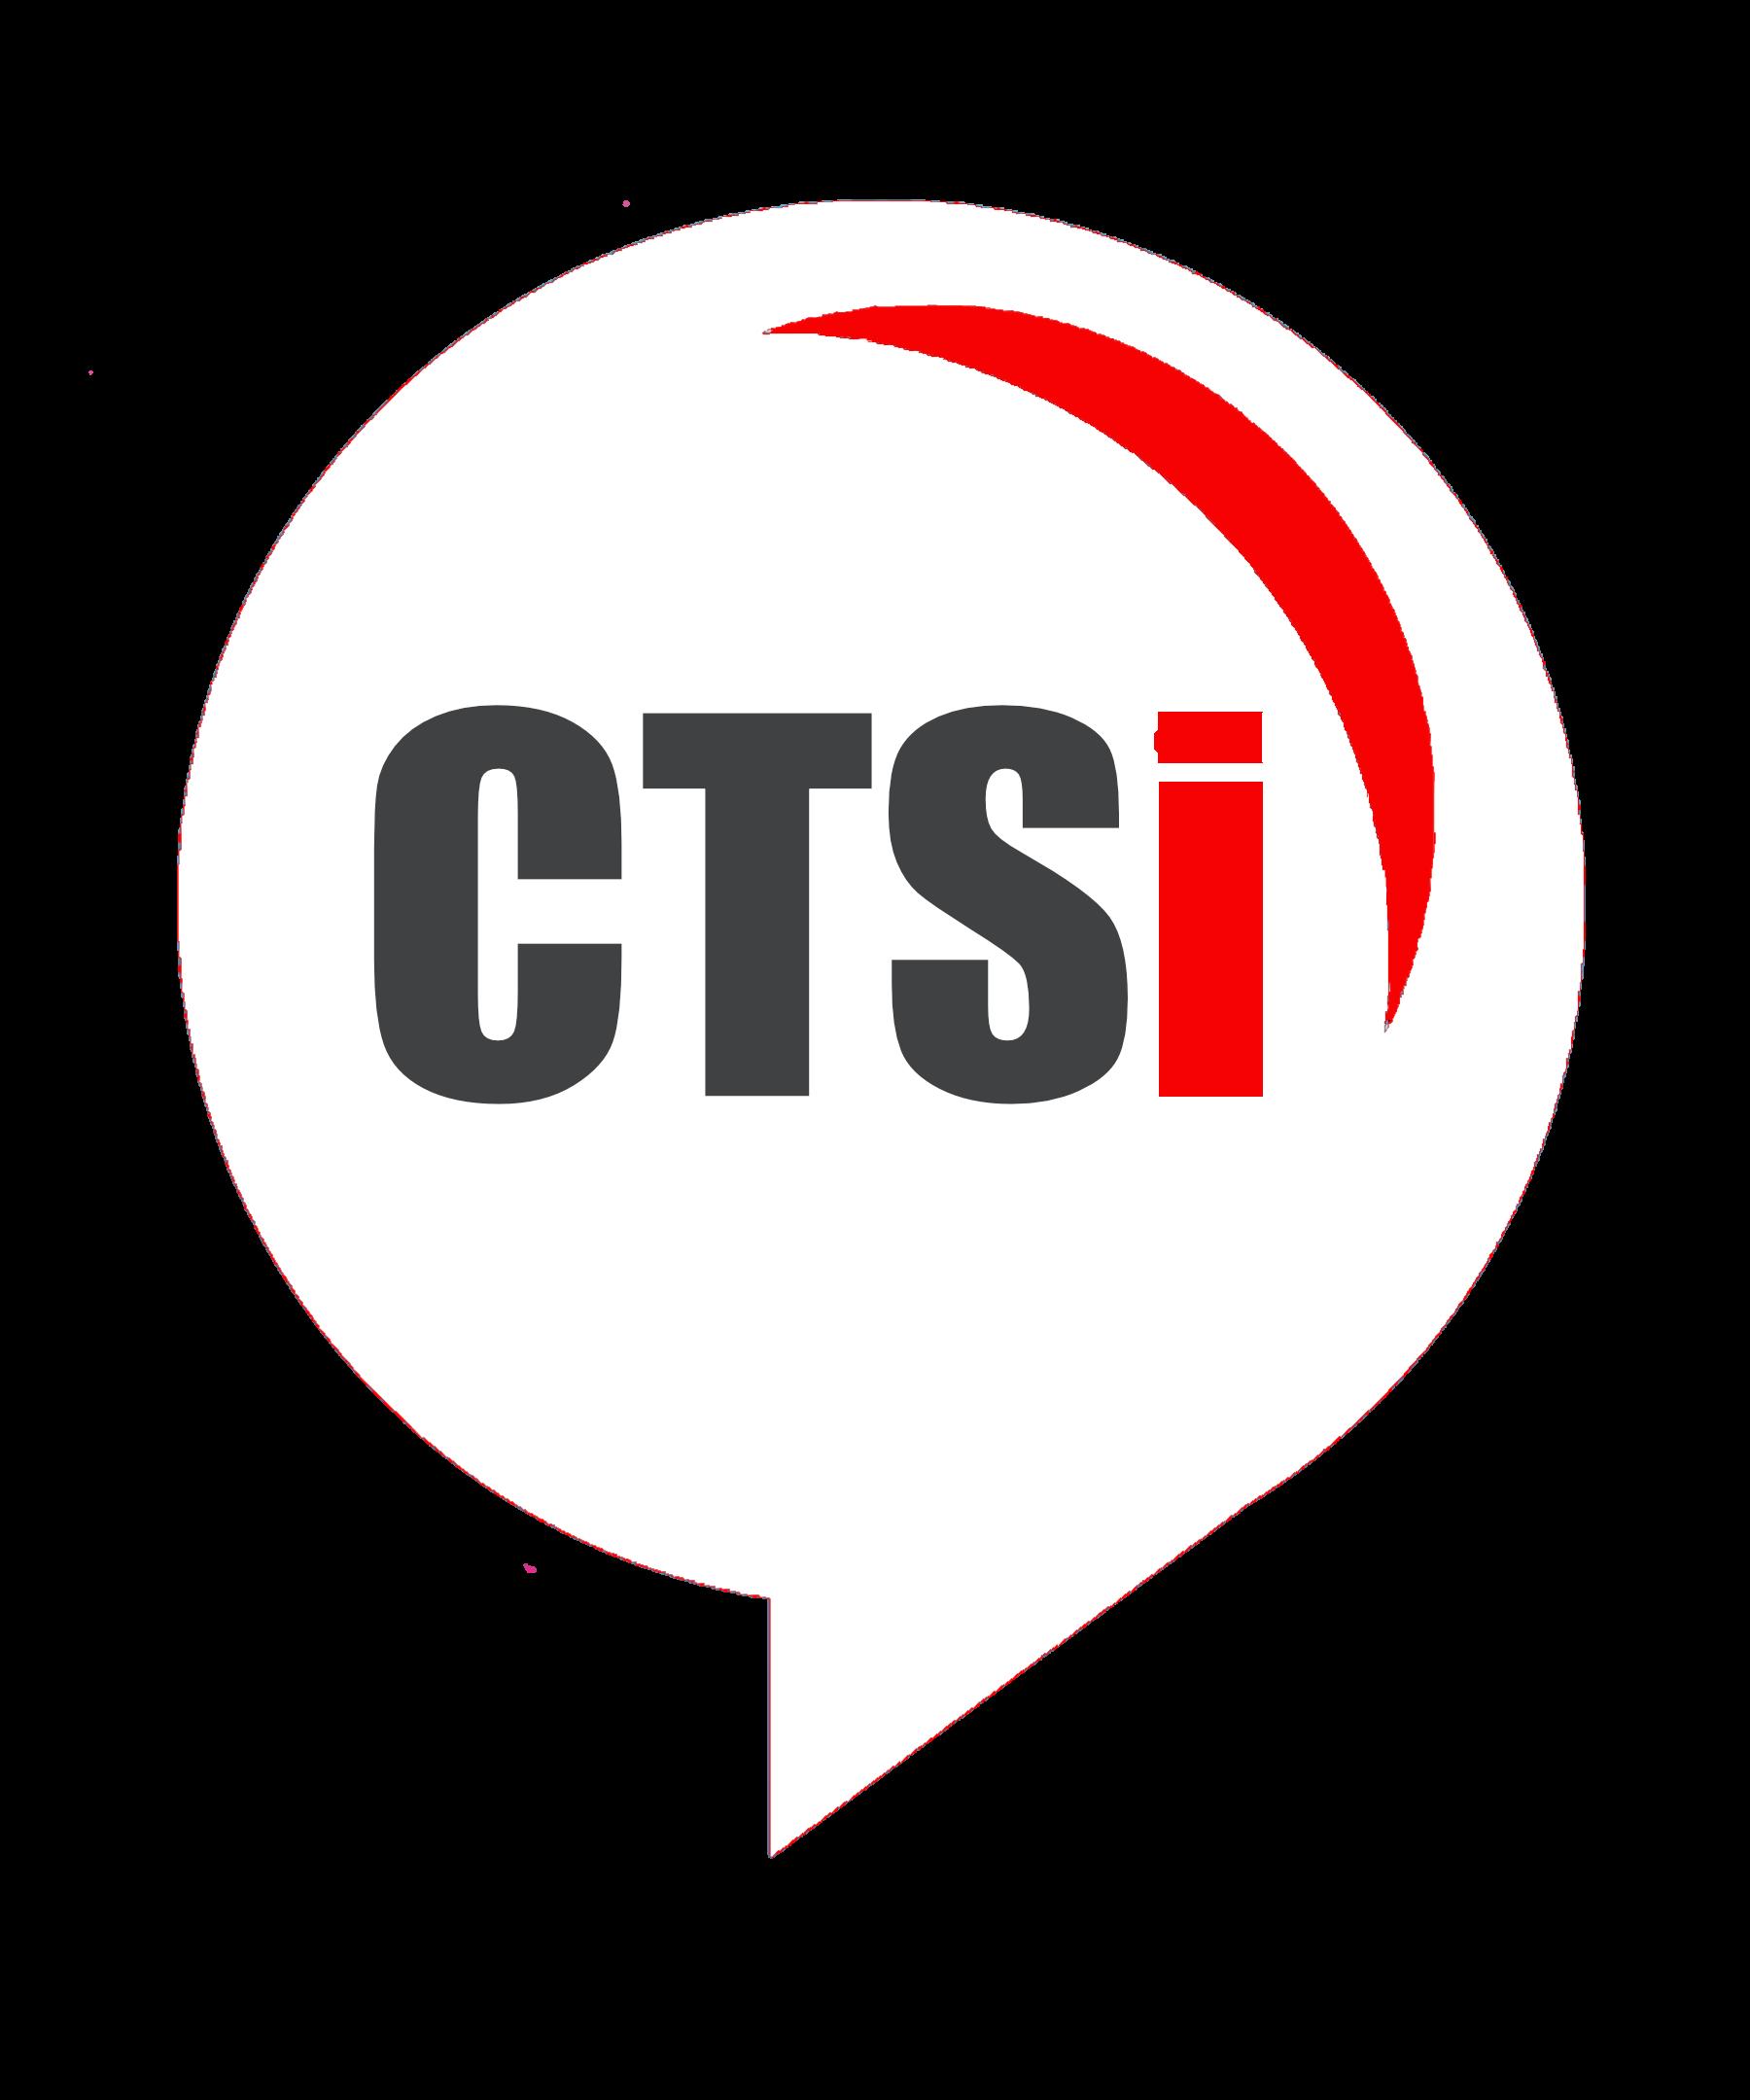 CTSI_SHORT_LOGO HITE.png